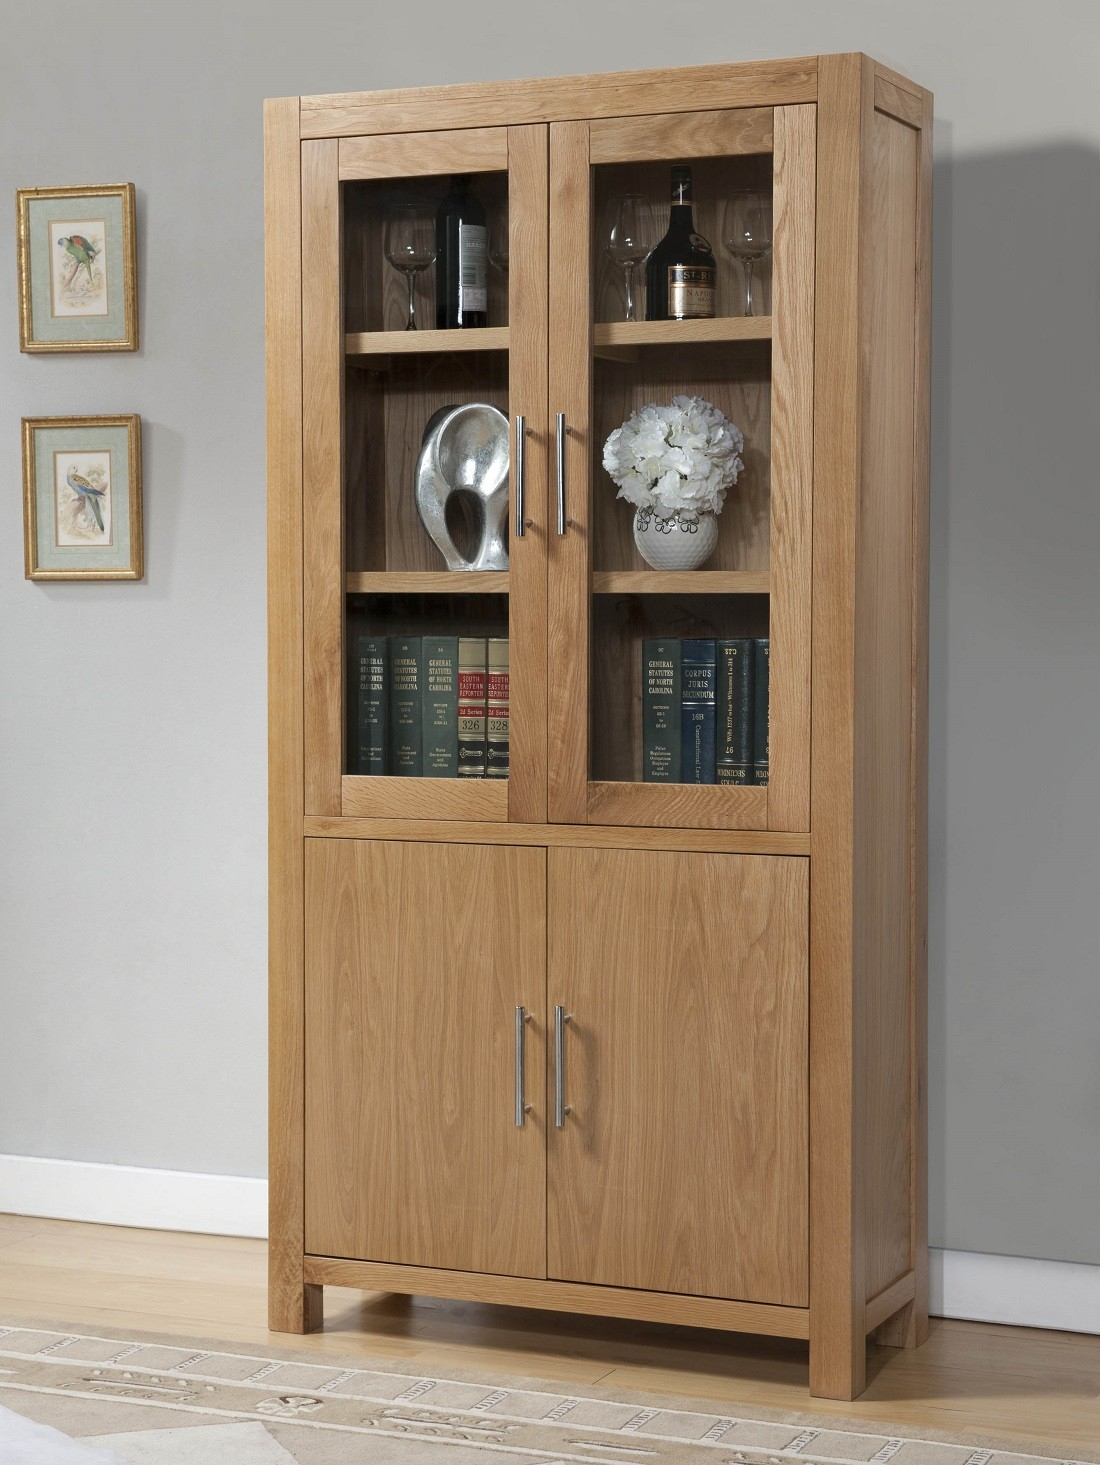 Aylesbury Contemporary Light Oak Display Cabinet Oak Furniture Uk pertaining to measurements 1100 X 1465